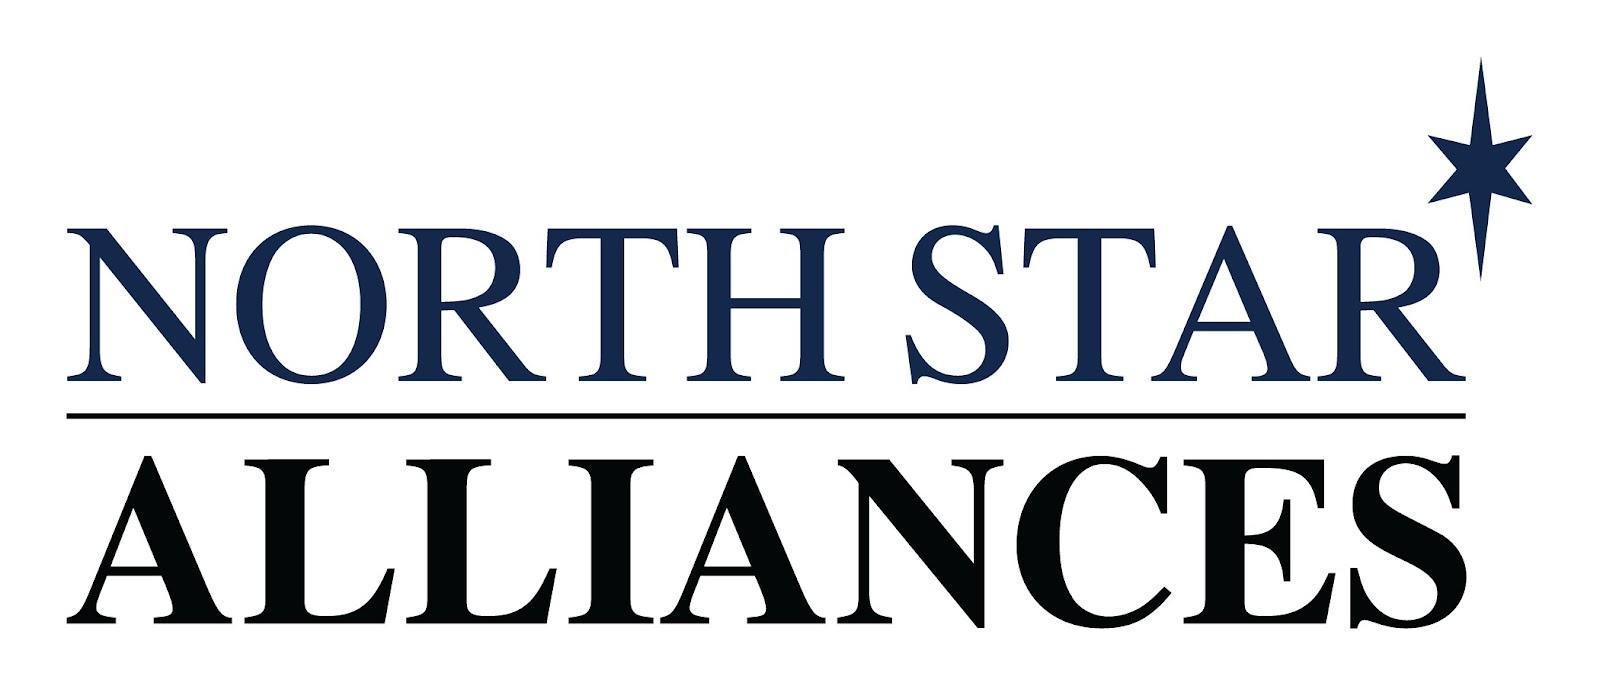 North Star Alliances | LinkedIn